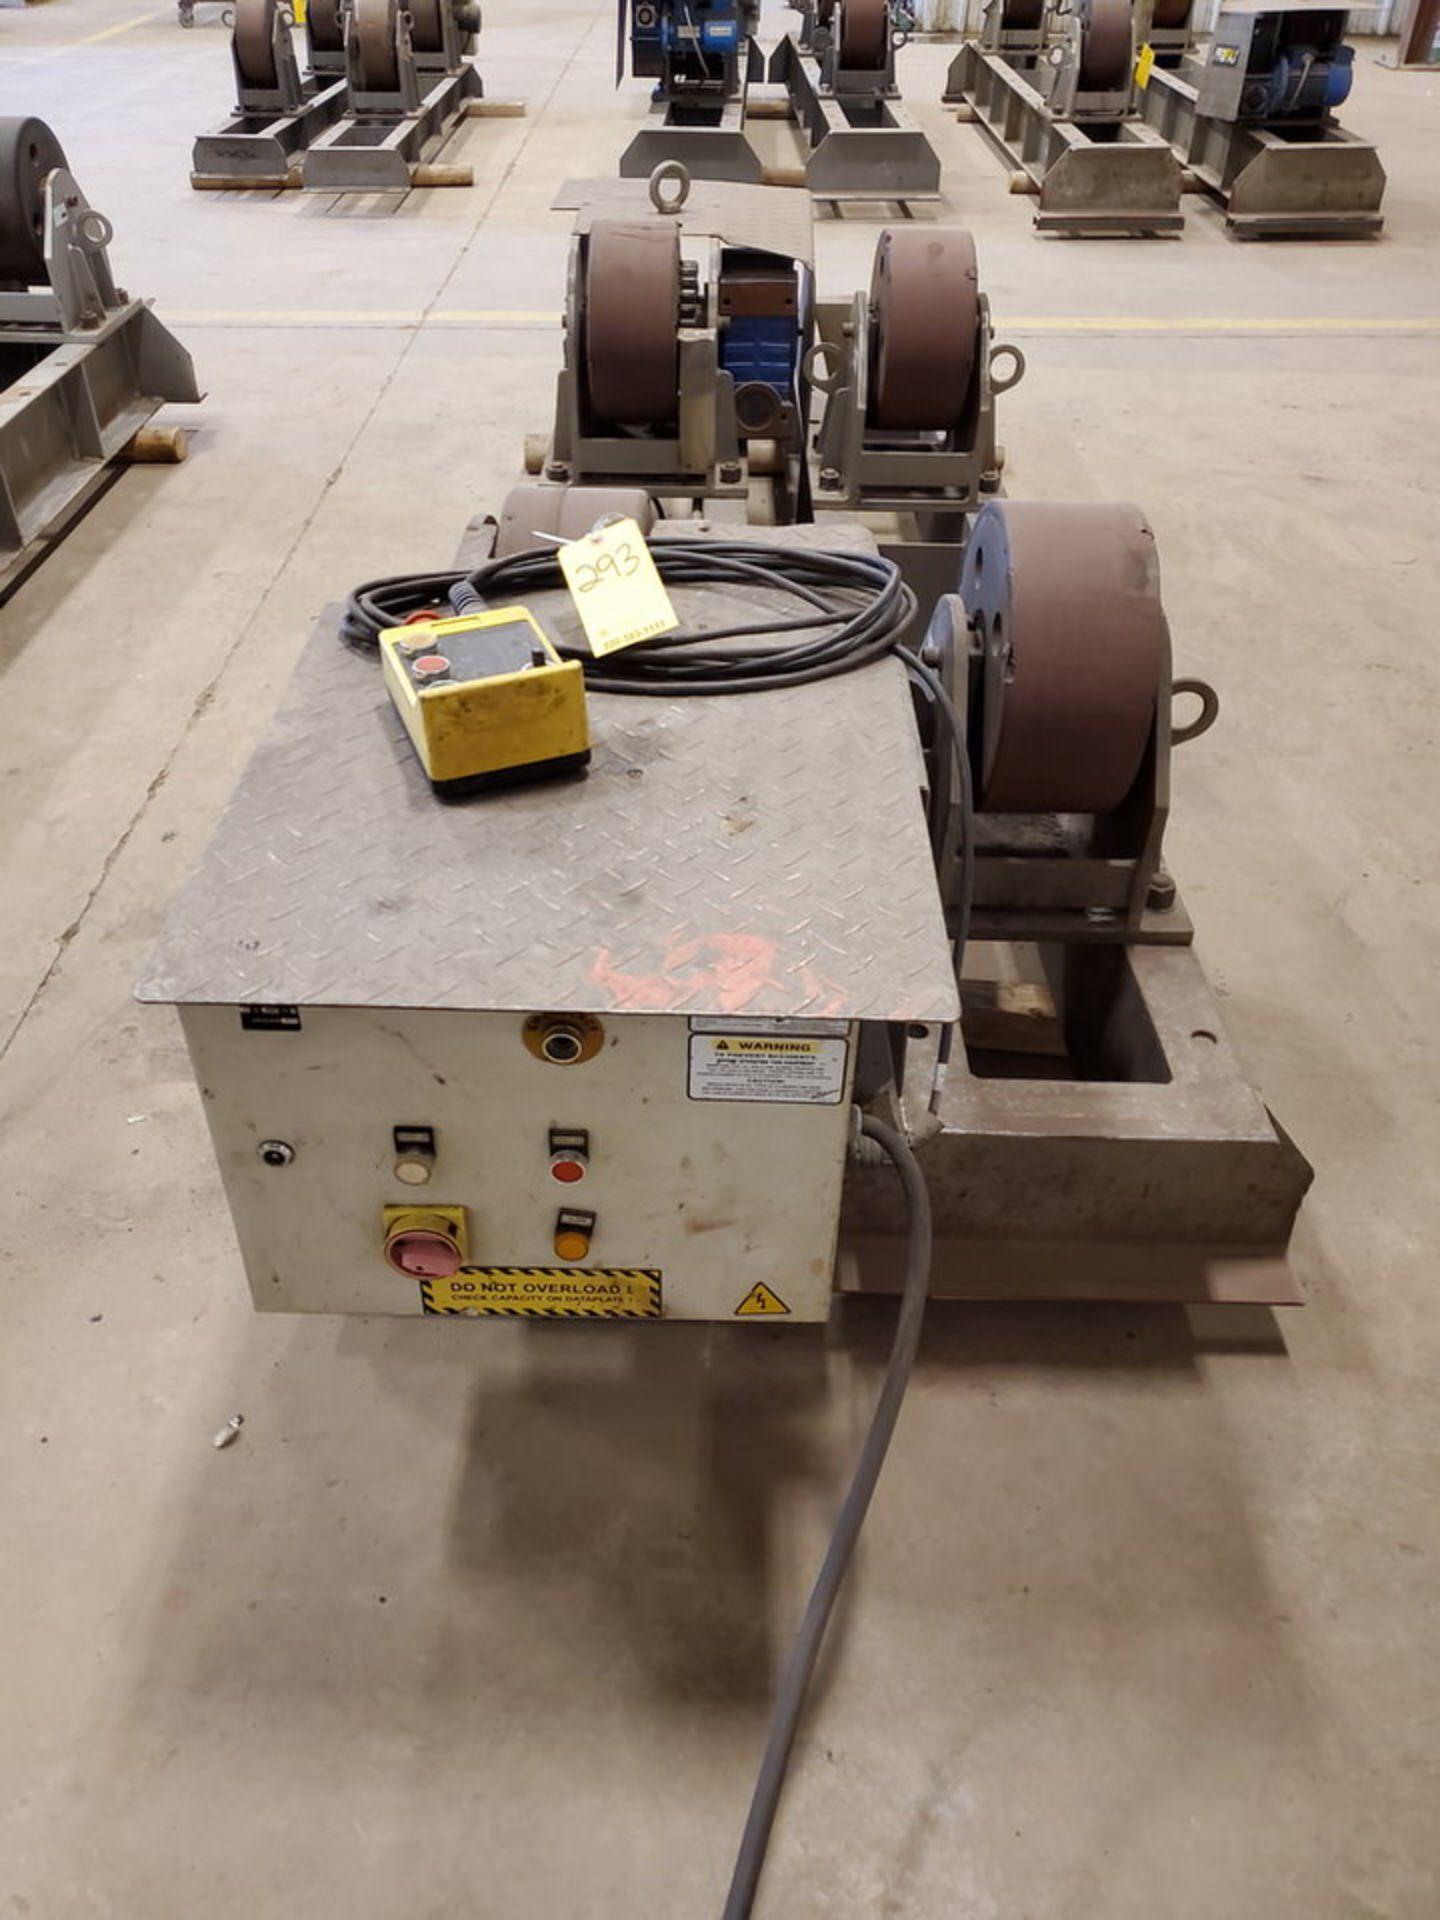 "Profax TR-40000 Turn Roll 40K Cap., 440V, 15A, 50/60HZ, 3PH, RPM: 0-1.7, 6"" Wheel Dia - Image 2 of 8"